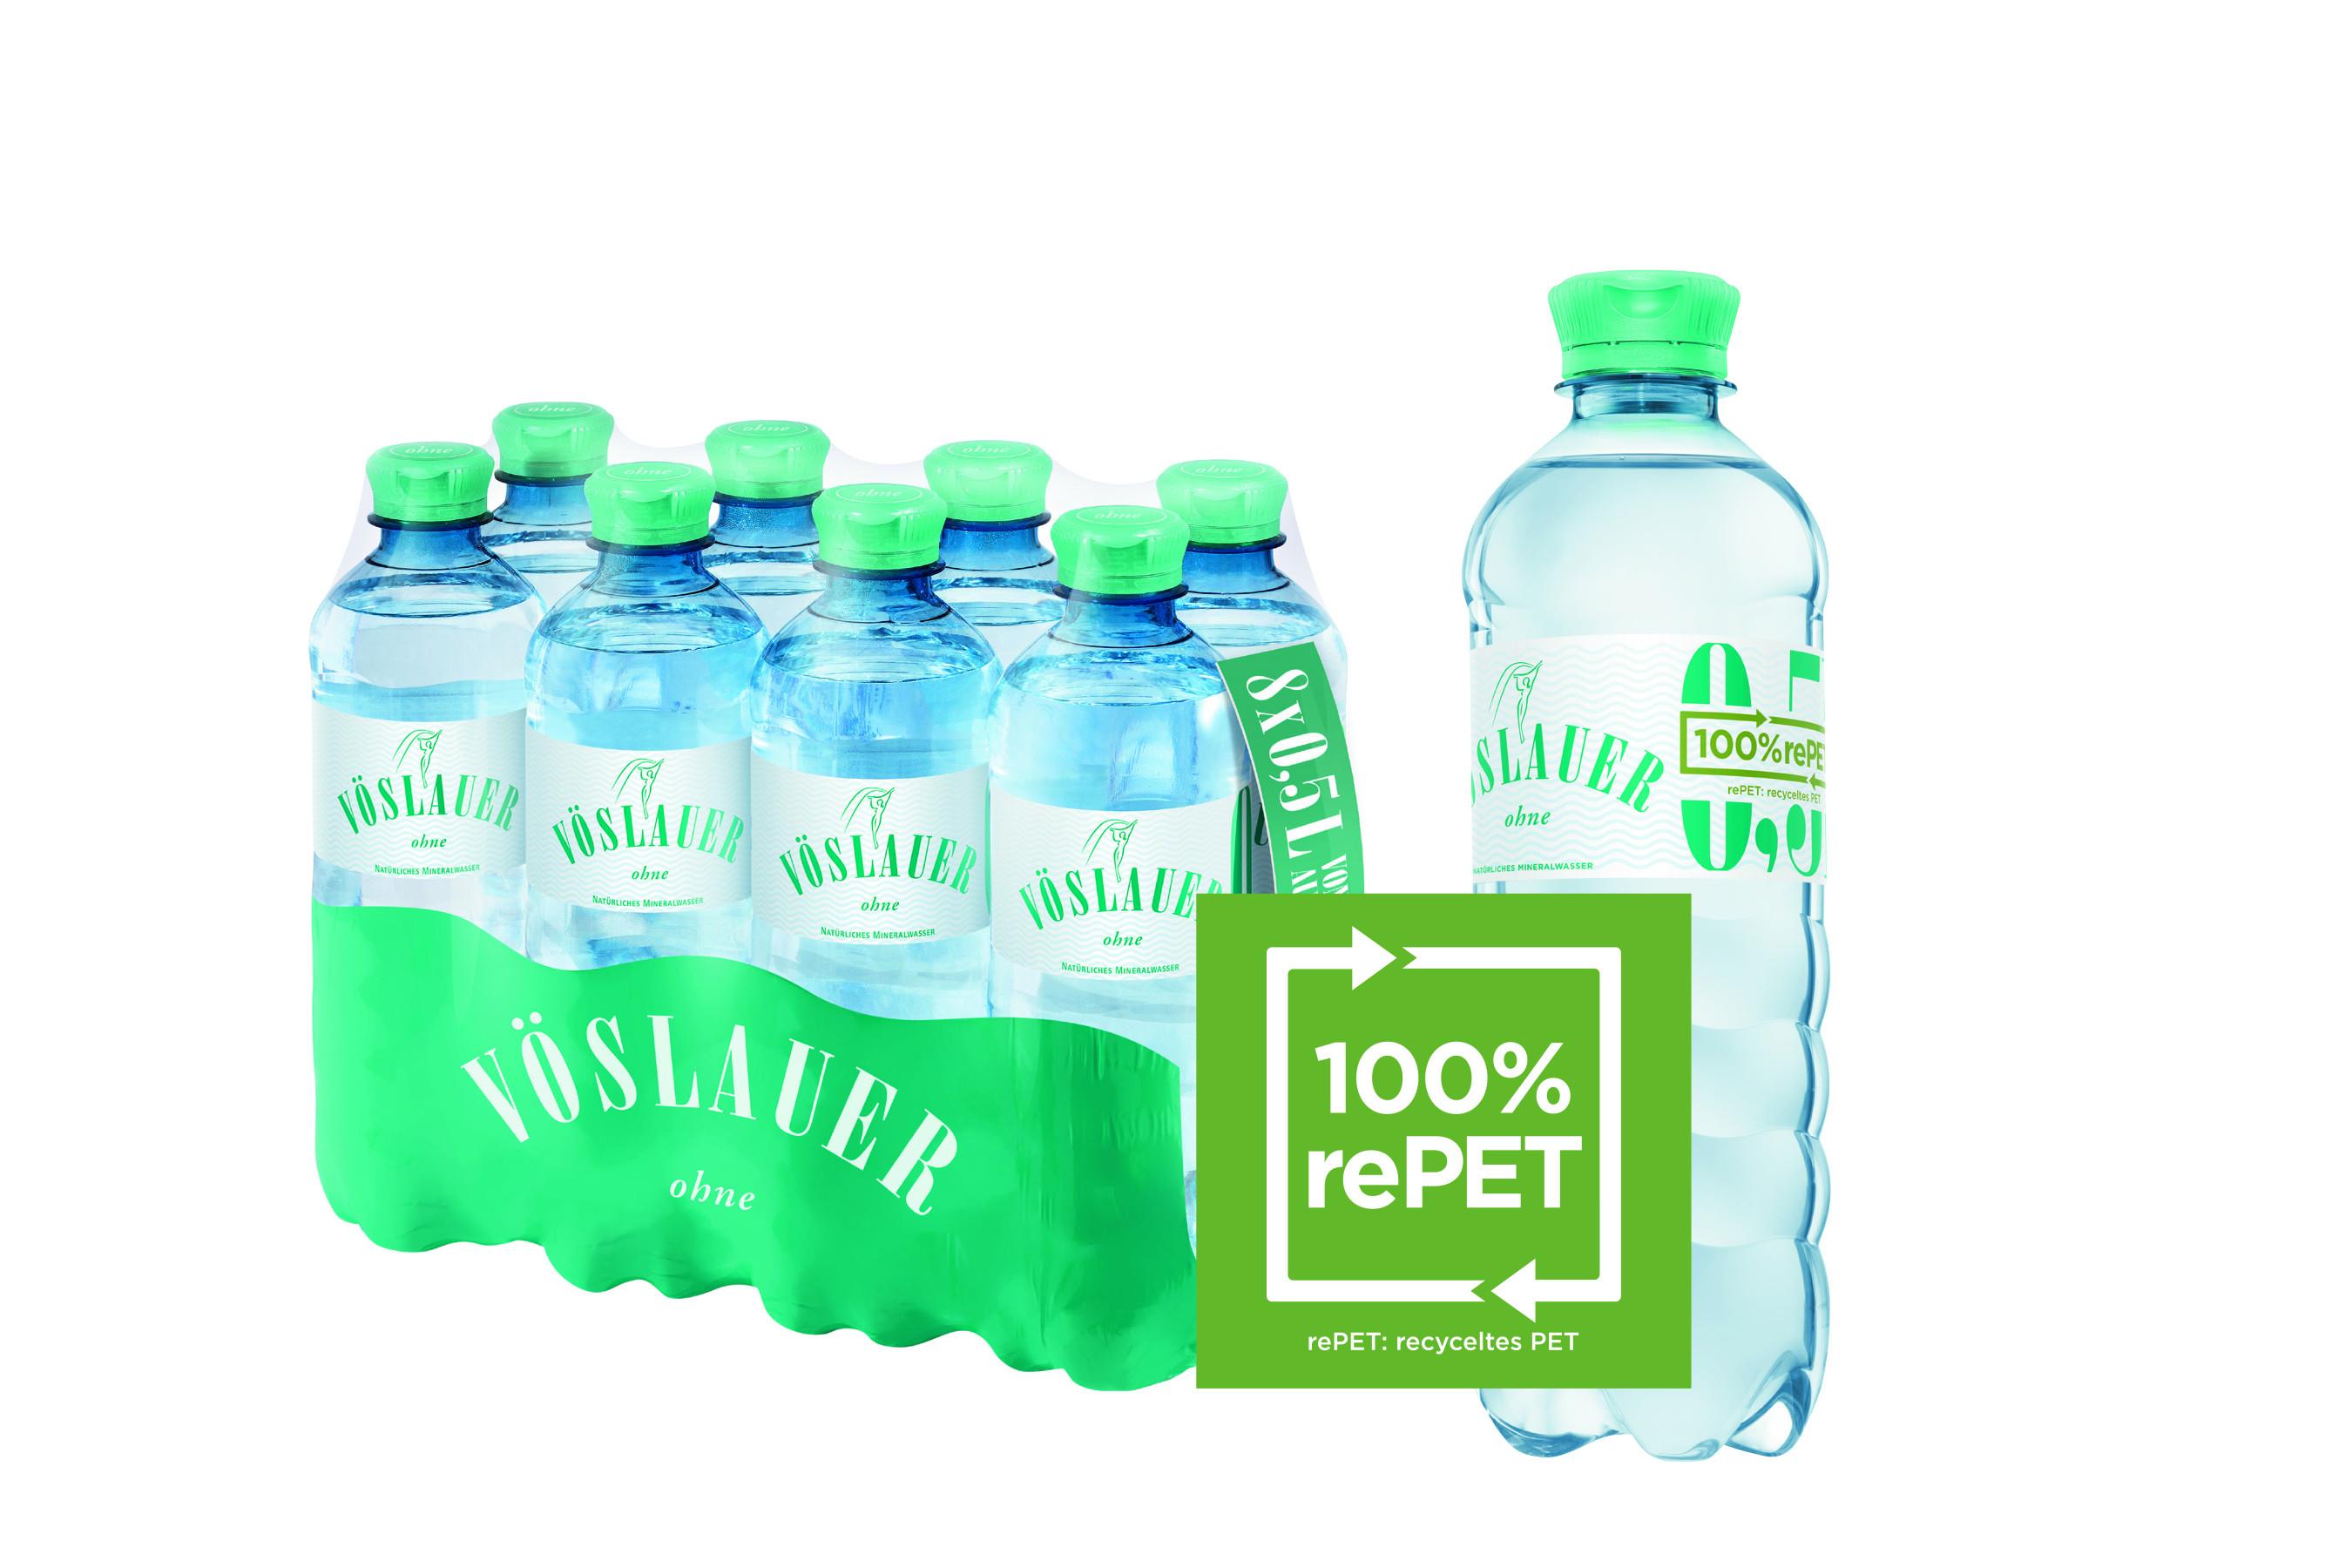 Vöslauer-Flasche aus 100 % rePET